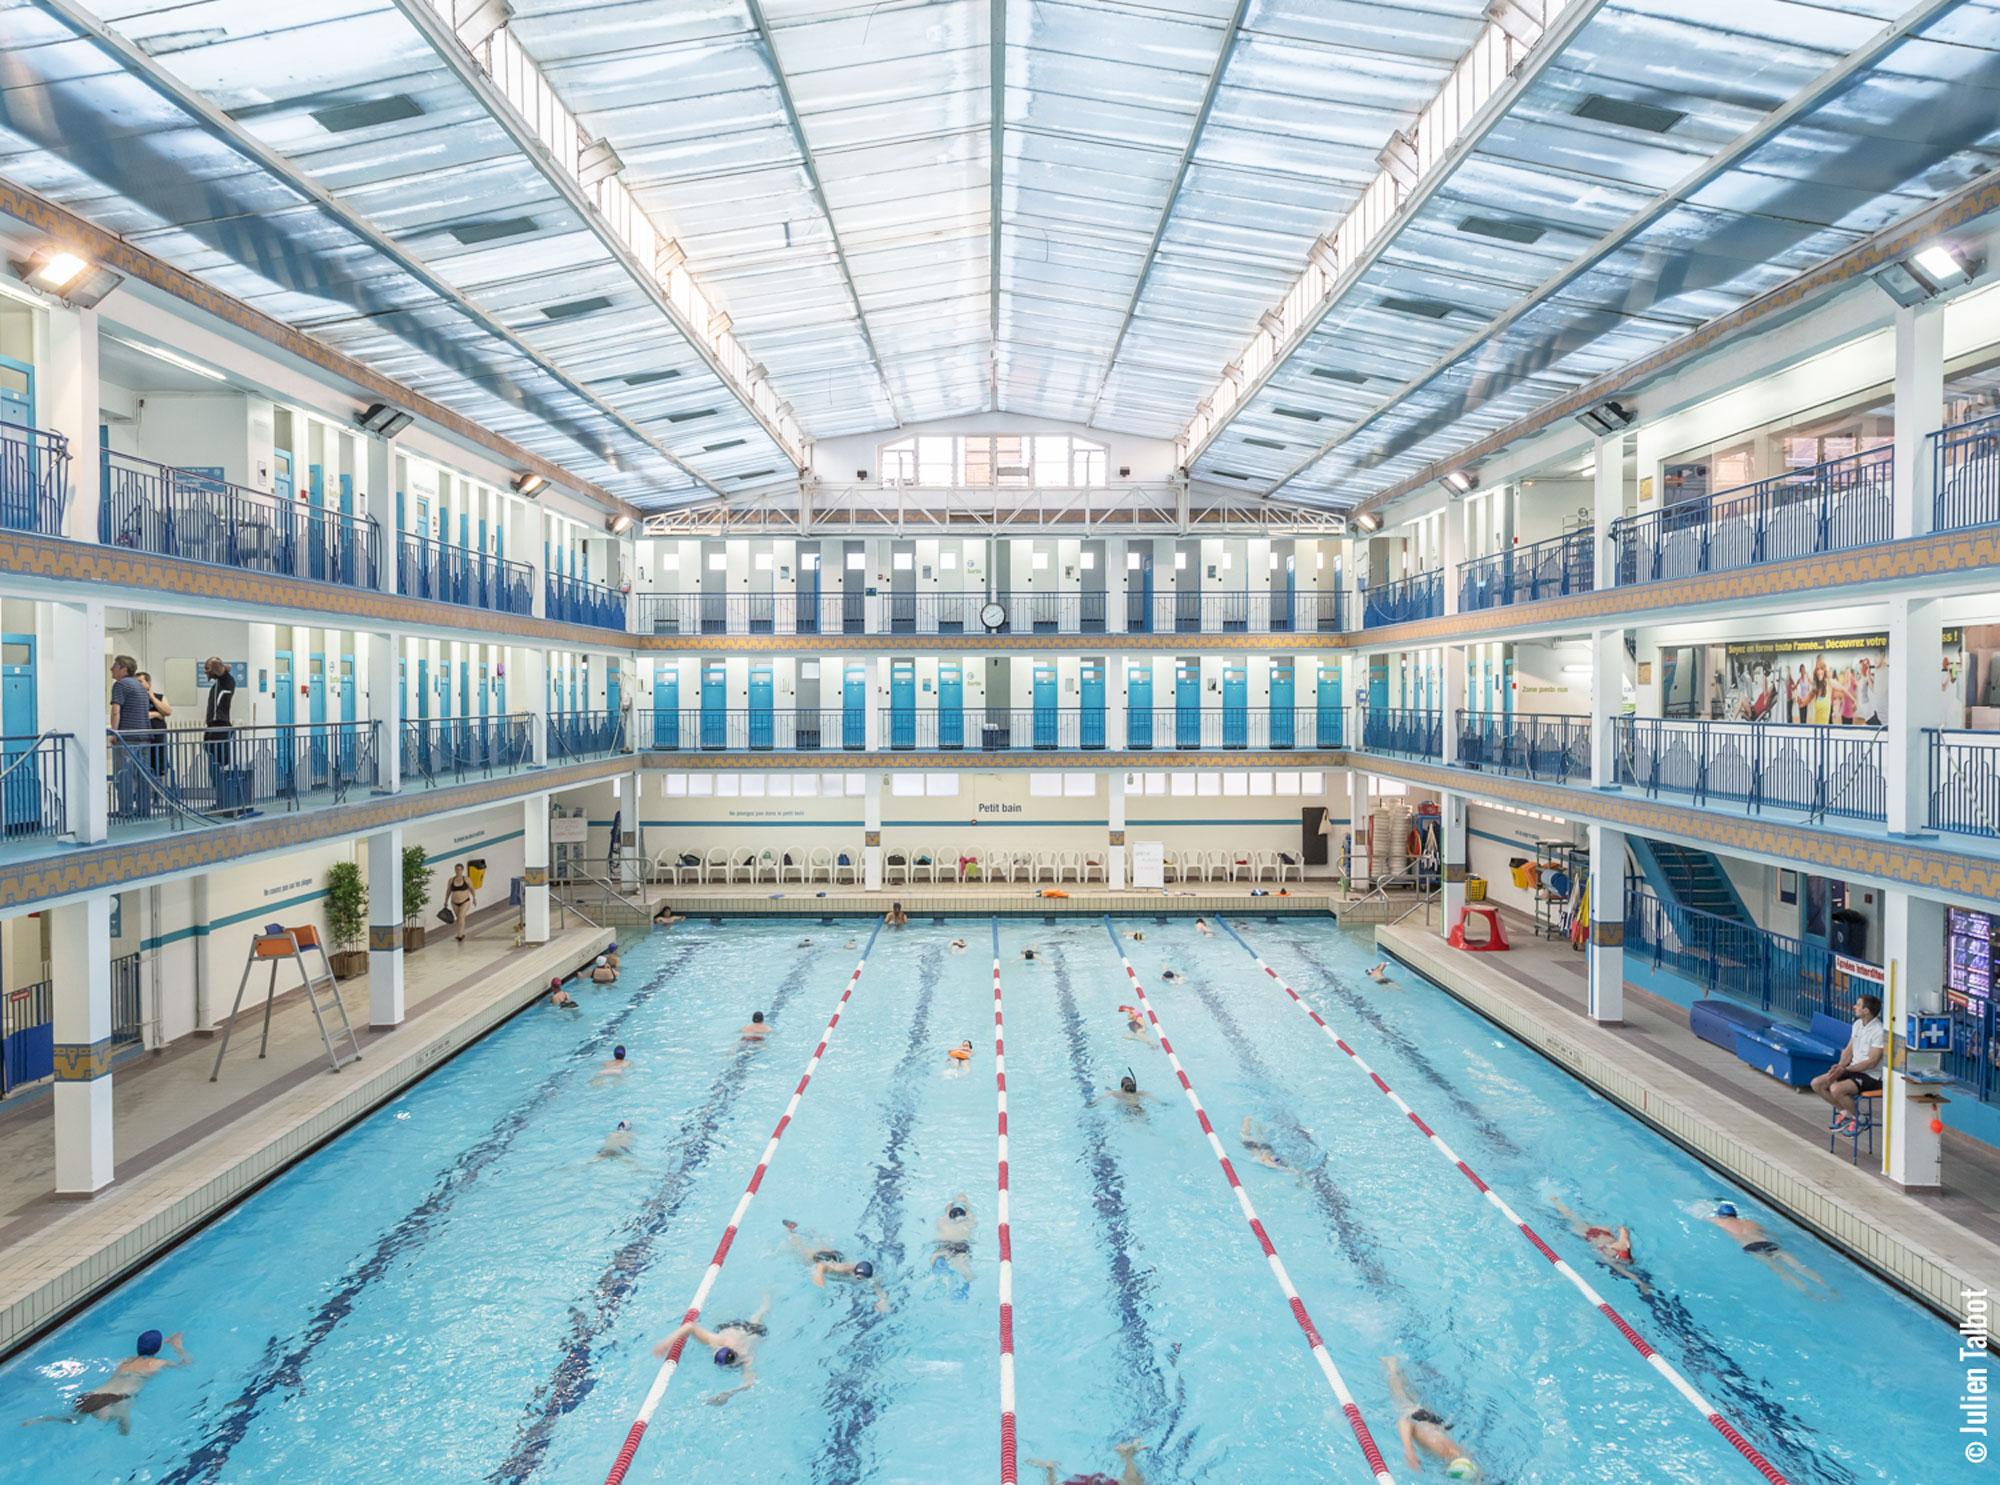 Piscine Pontoise Quartier Latin - One Of The Best Swimming ... pour Julien Piscine